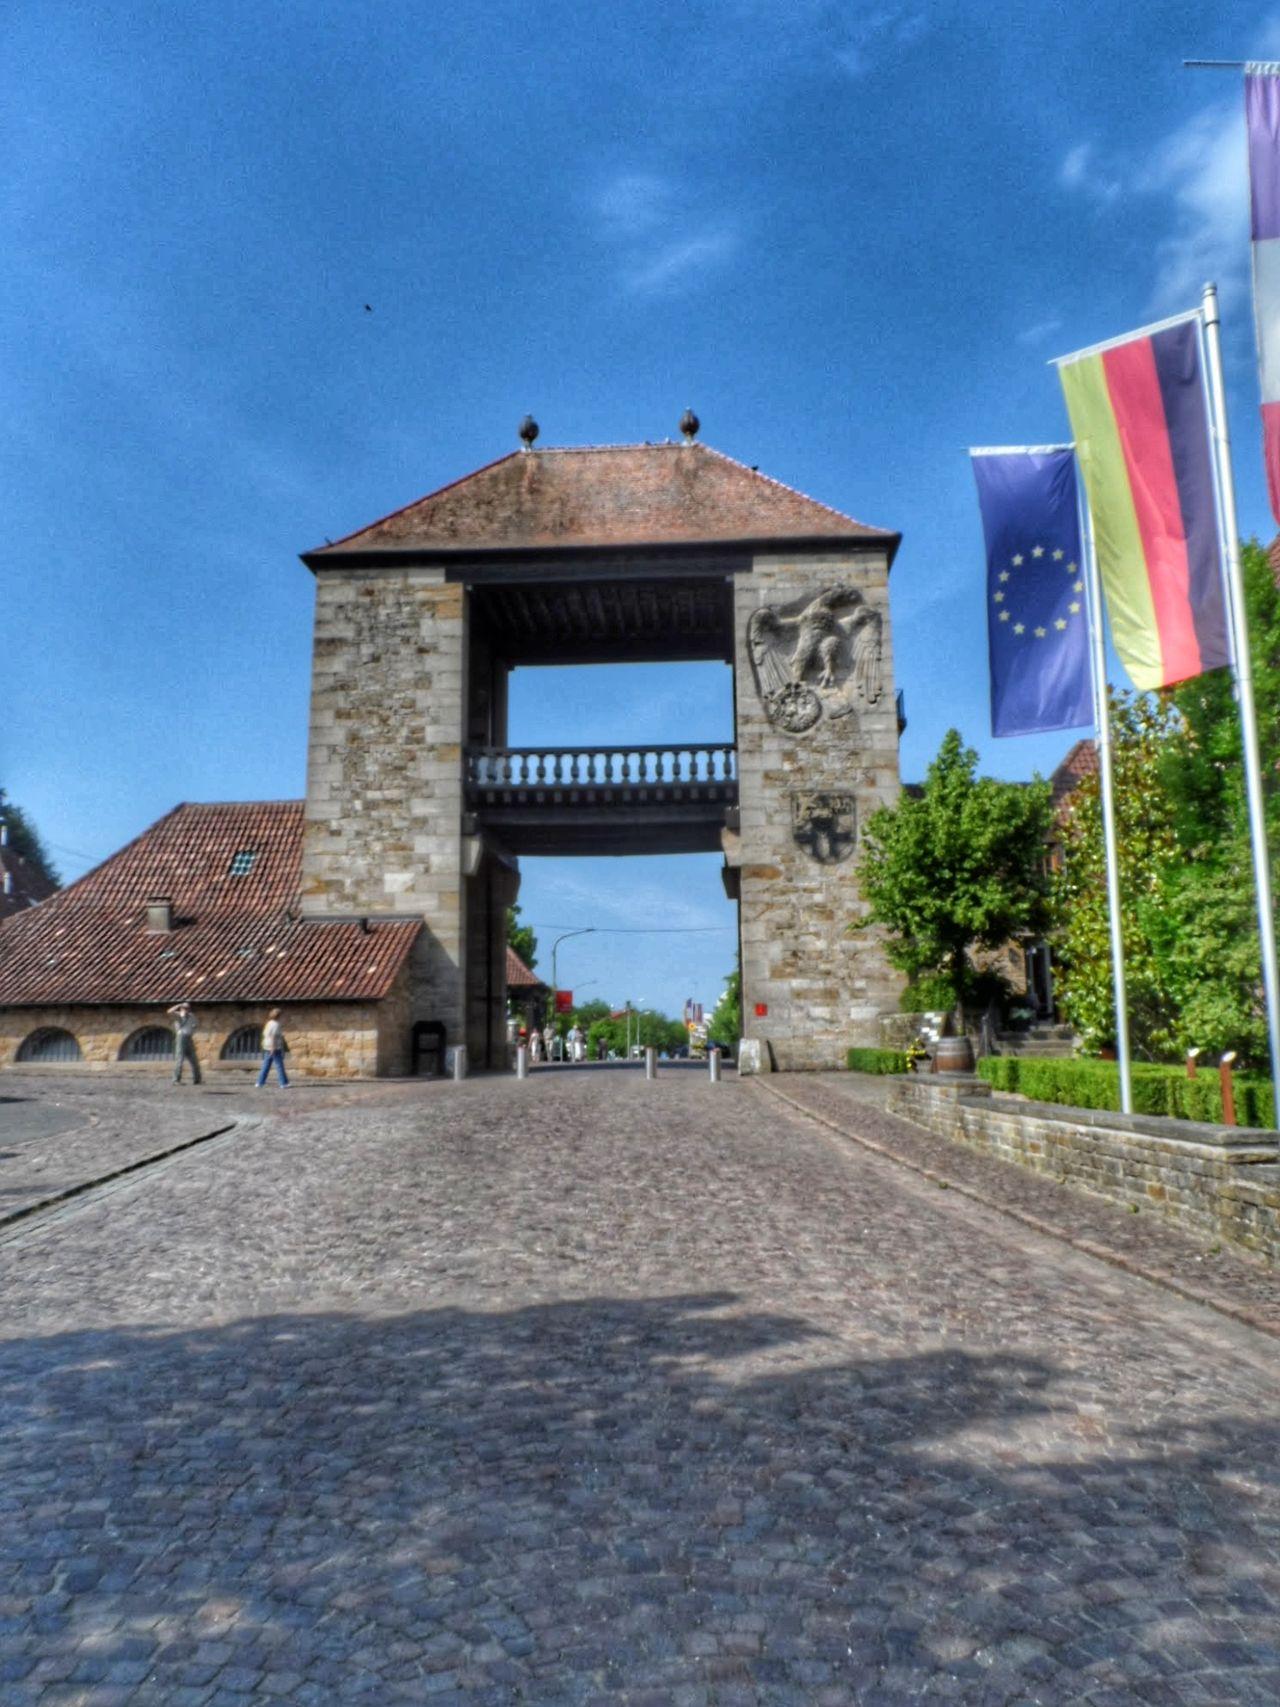 German Wine Gate GERMANY🇩🇪DEUTSCHERLAND@ France🇫🇷 Borderline Architecture Built Structure Building Exterior Sky Outdoors Day European Union